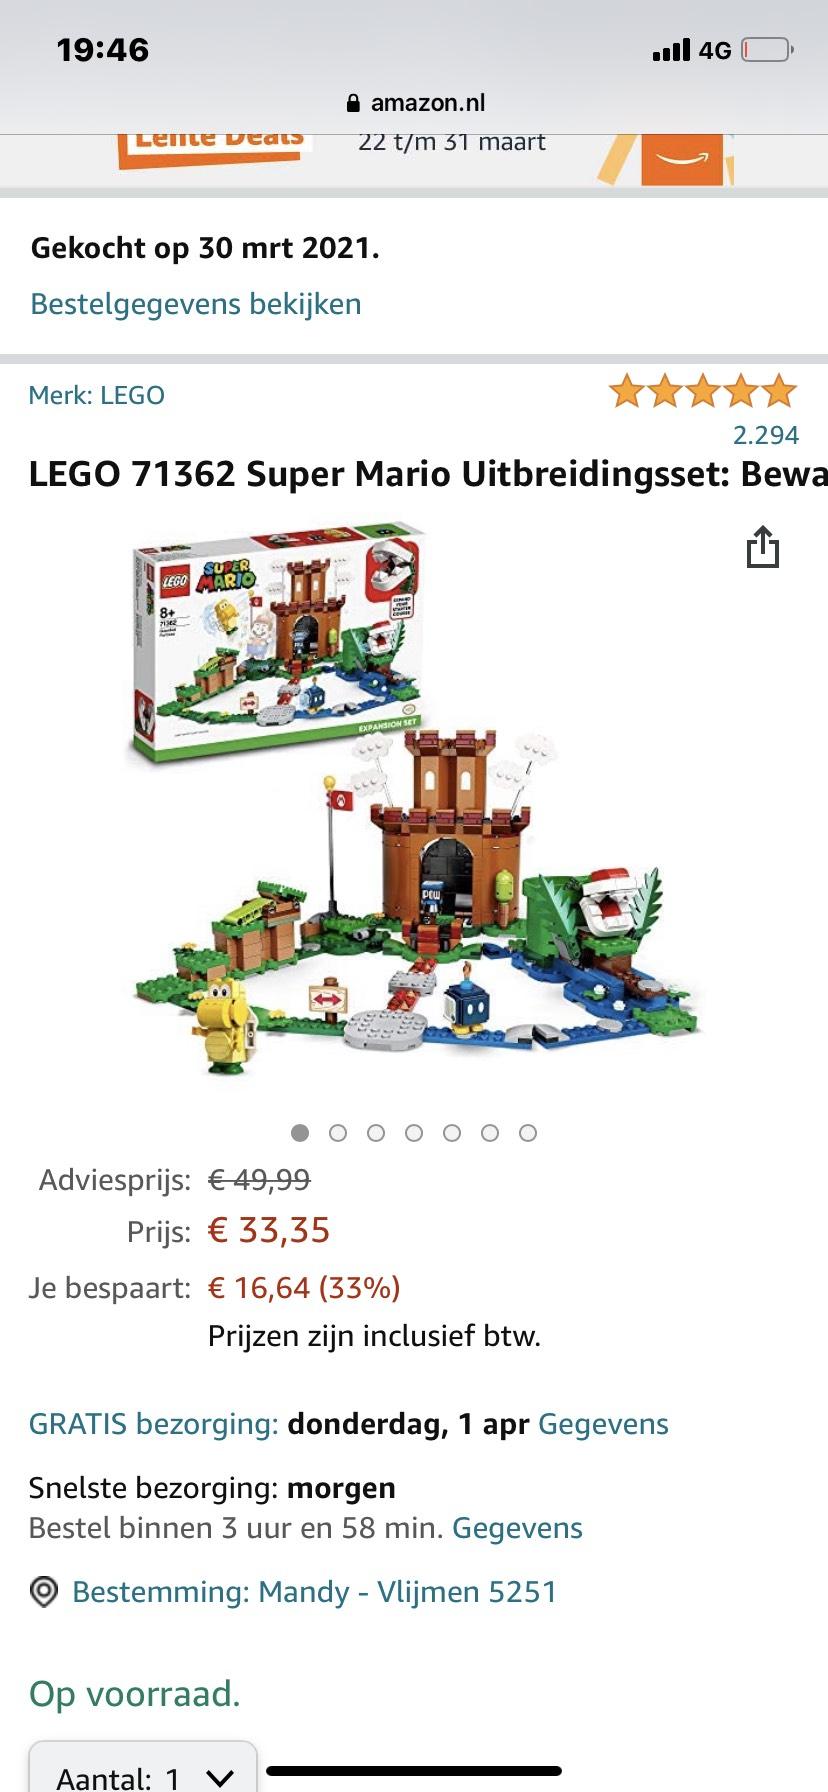 LEGO 71362 Super Mario Uitbreidingsset: Bewaakte vesting